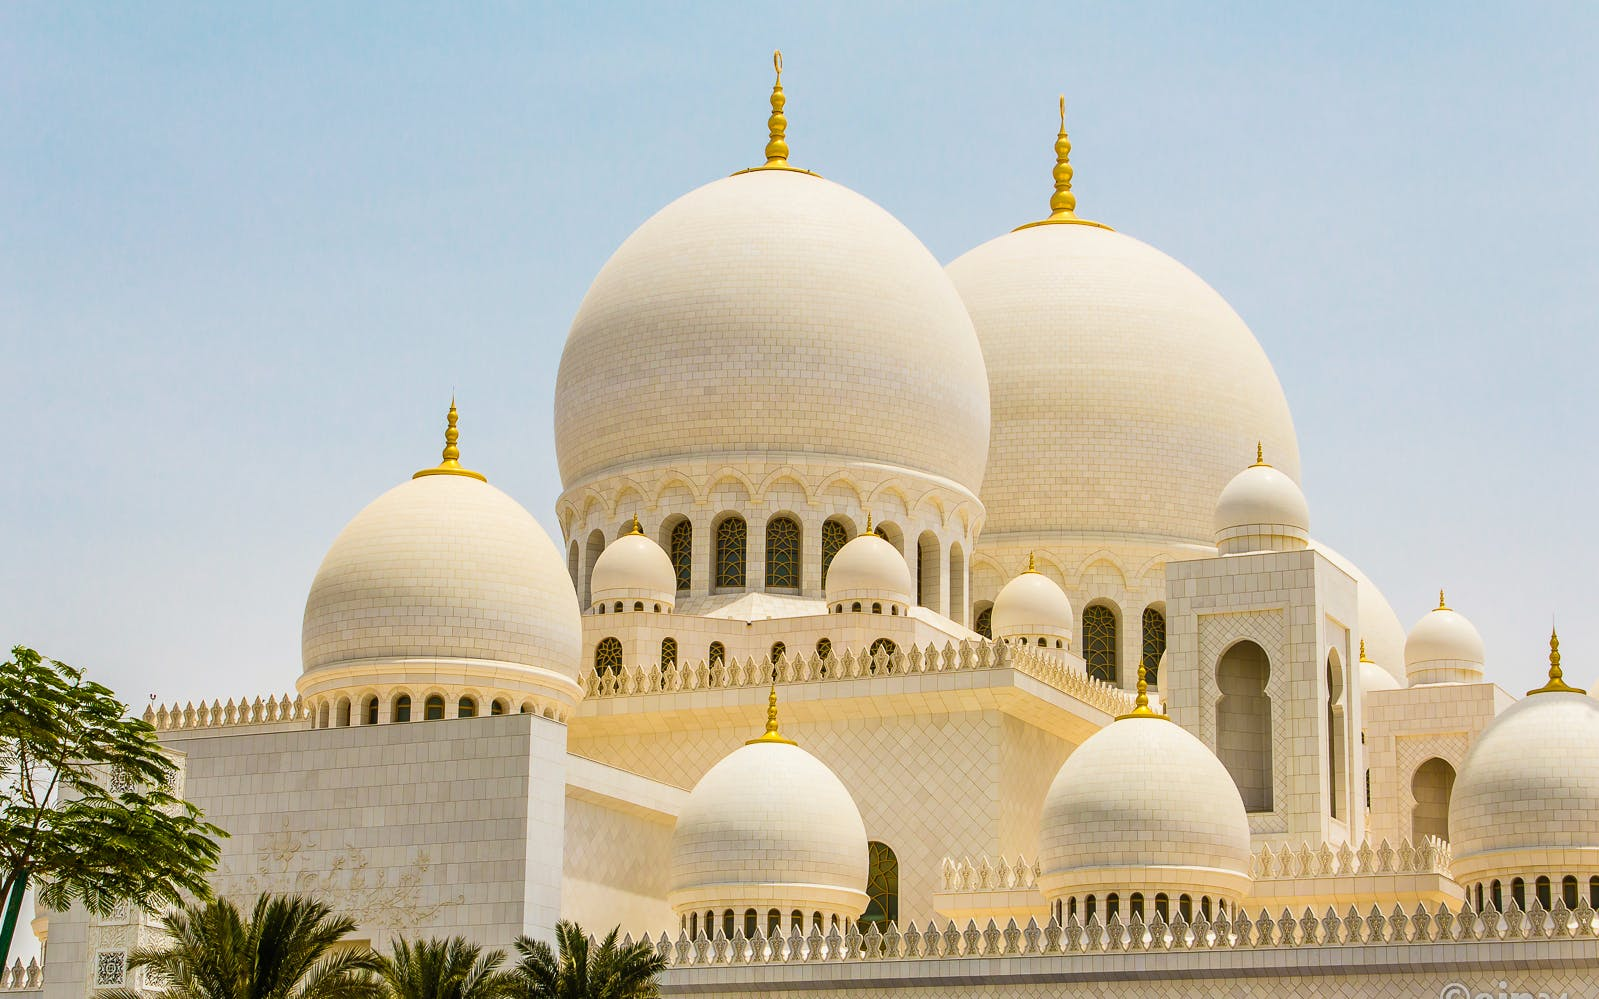 Abu Dhabi Day Trip Guide